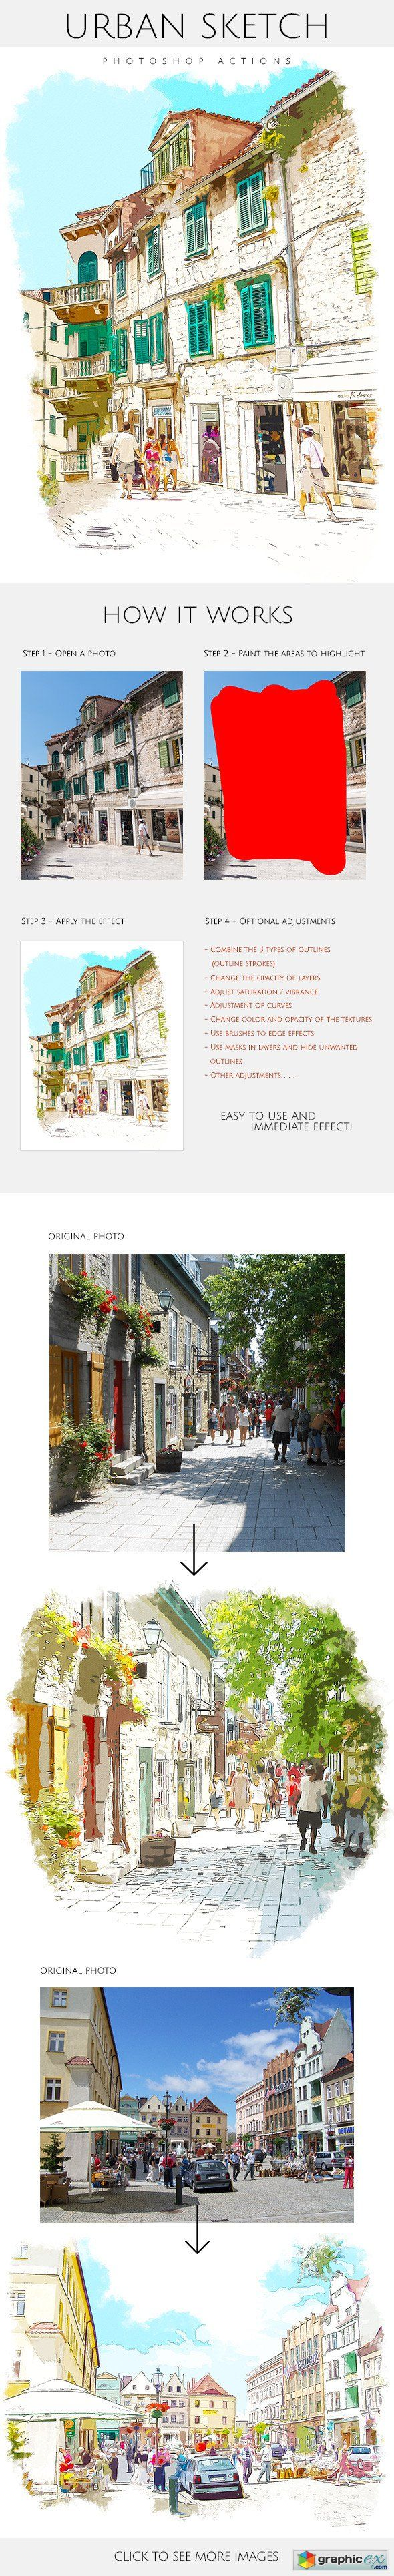 Urban Sketch - Photoshop Actions